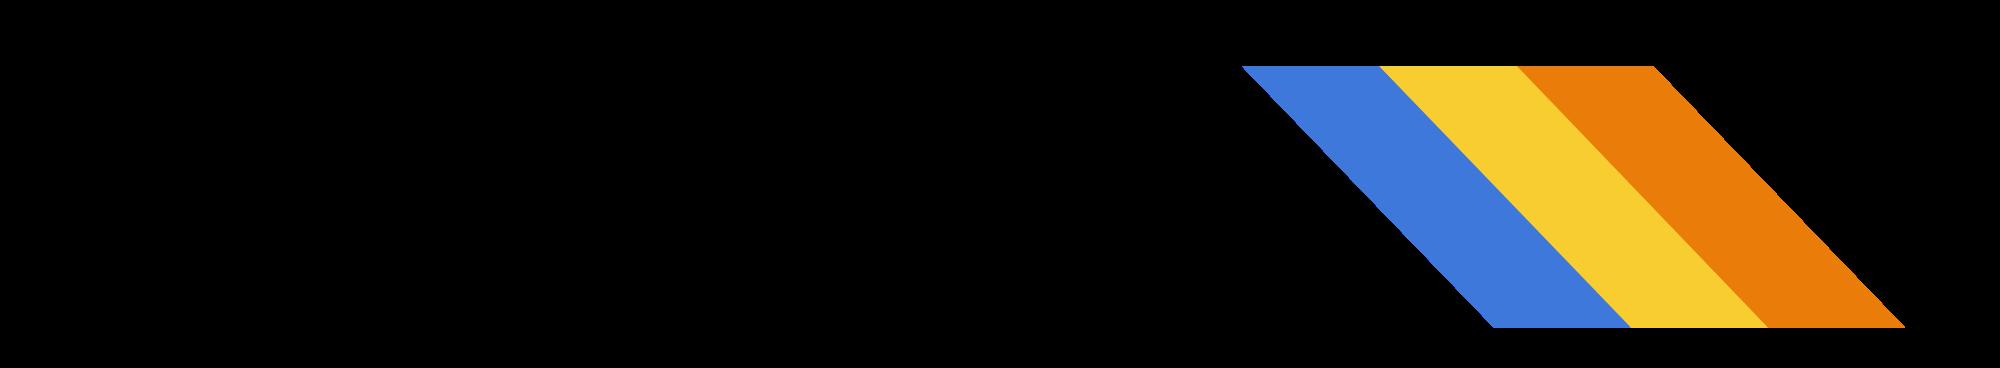 File:Logo of the Metropolitan Atlanta Rapid Transit Authority.svg.